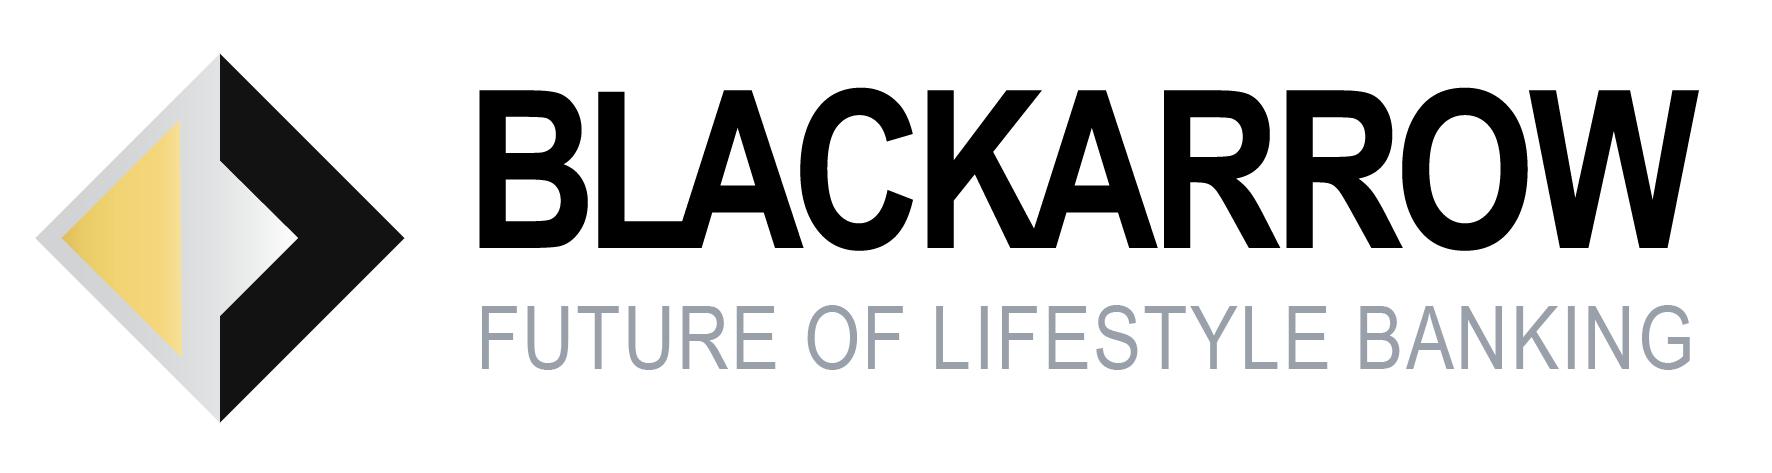 BlackArrow Financial Solutions Limited